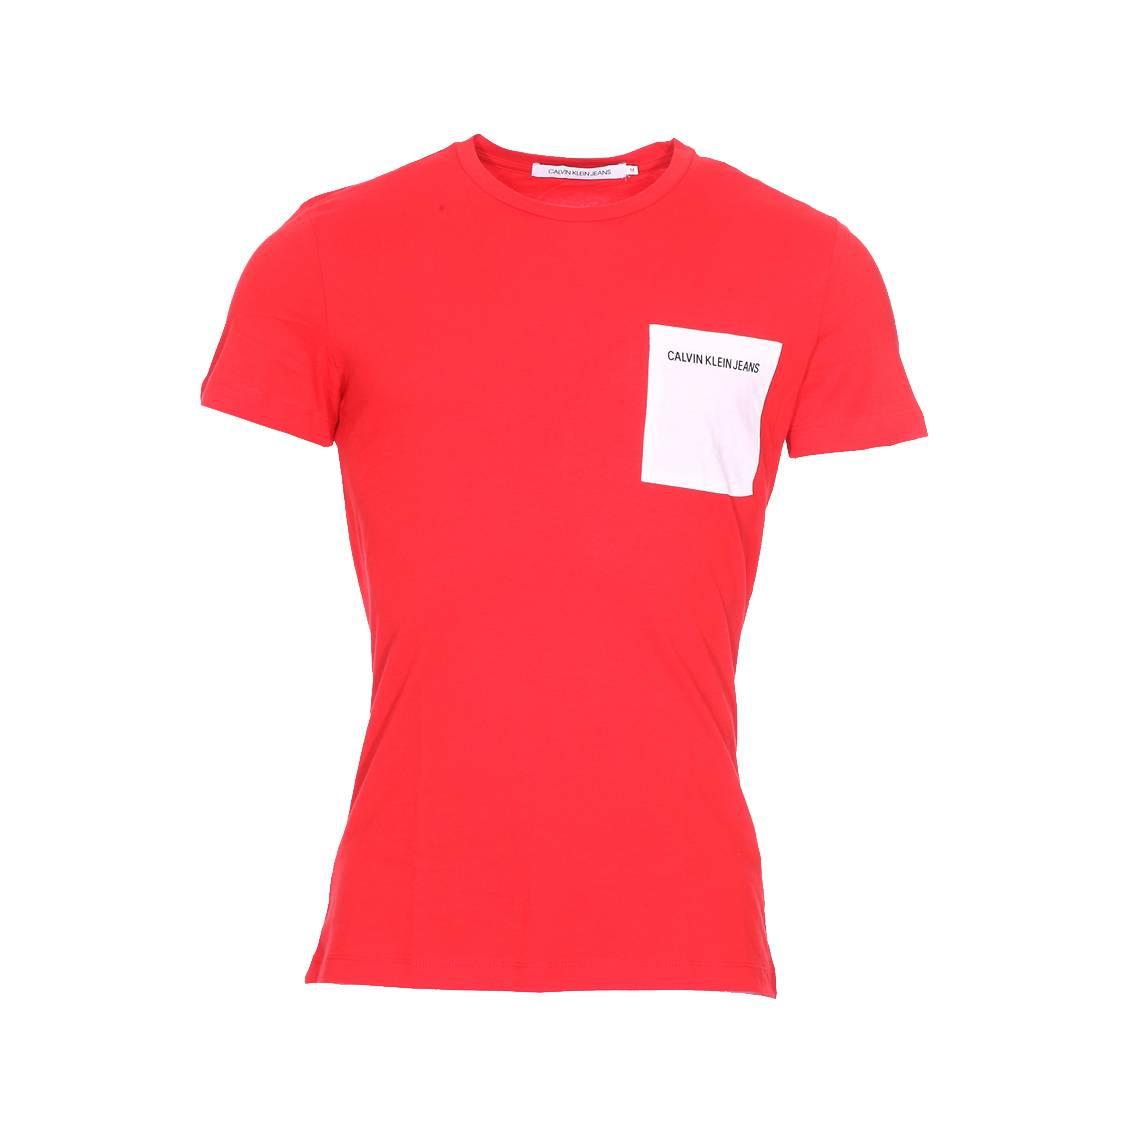 Tee-shirt col rond  pocket institutional logo slim en coton rouge à poche poitrine